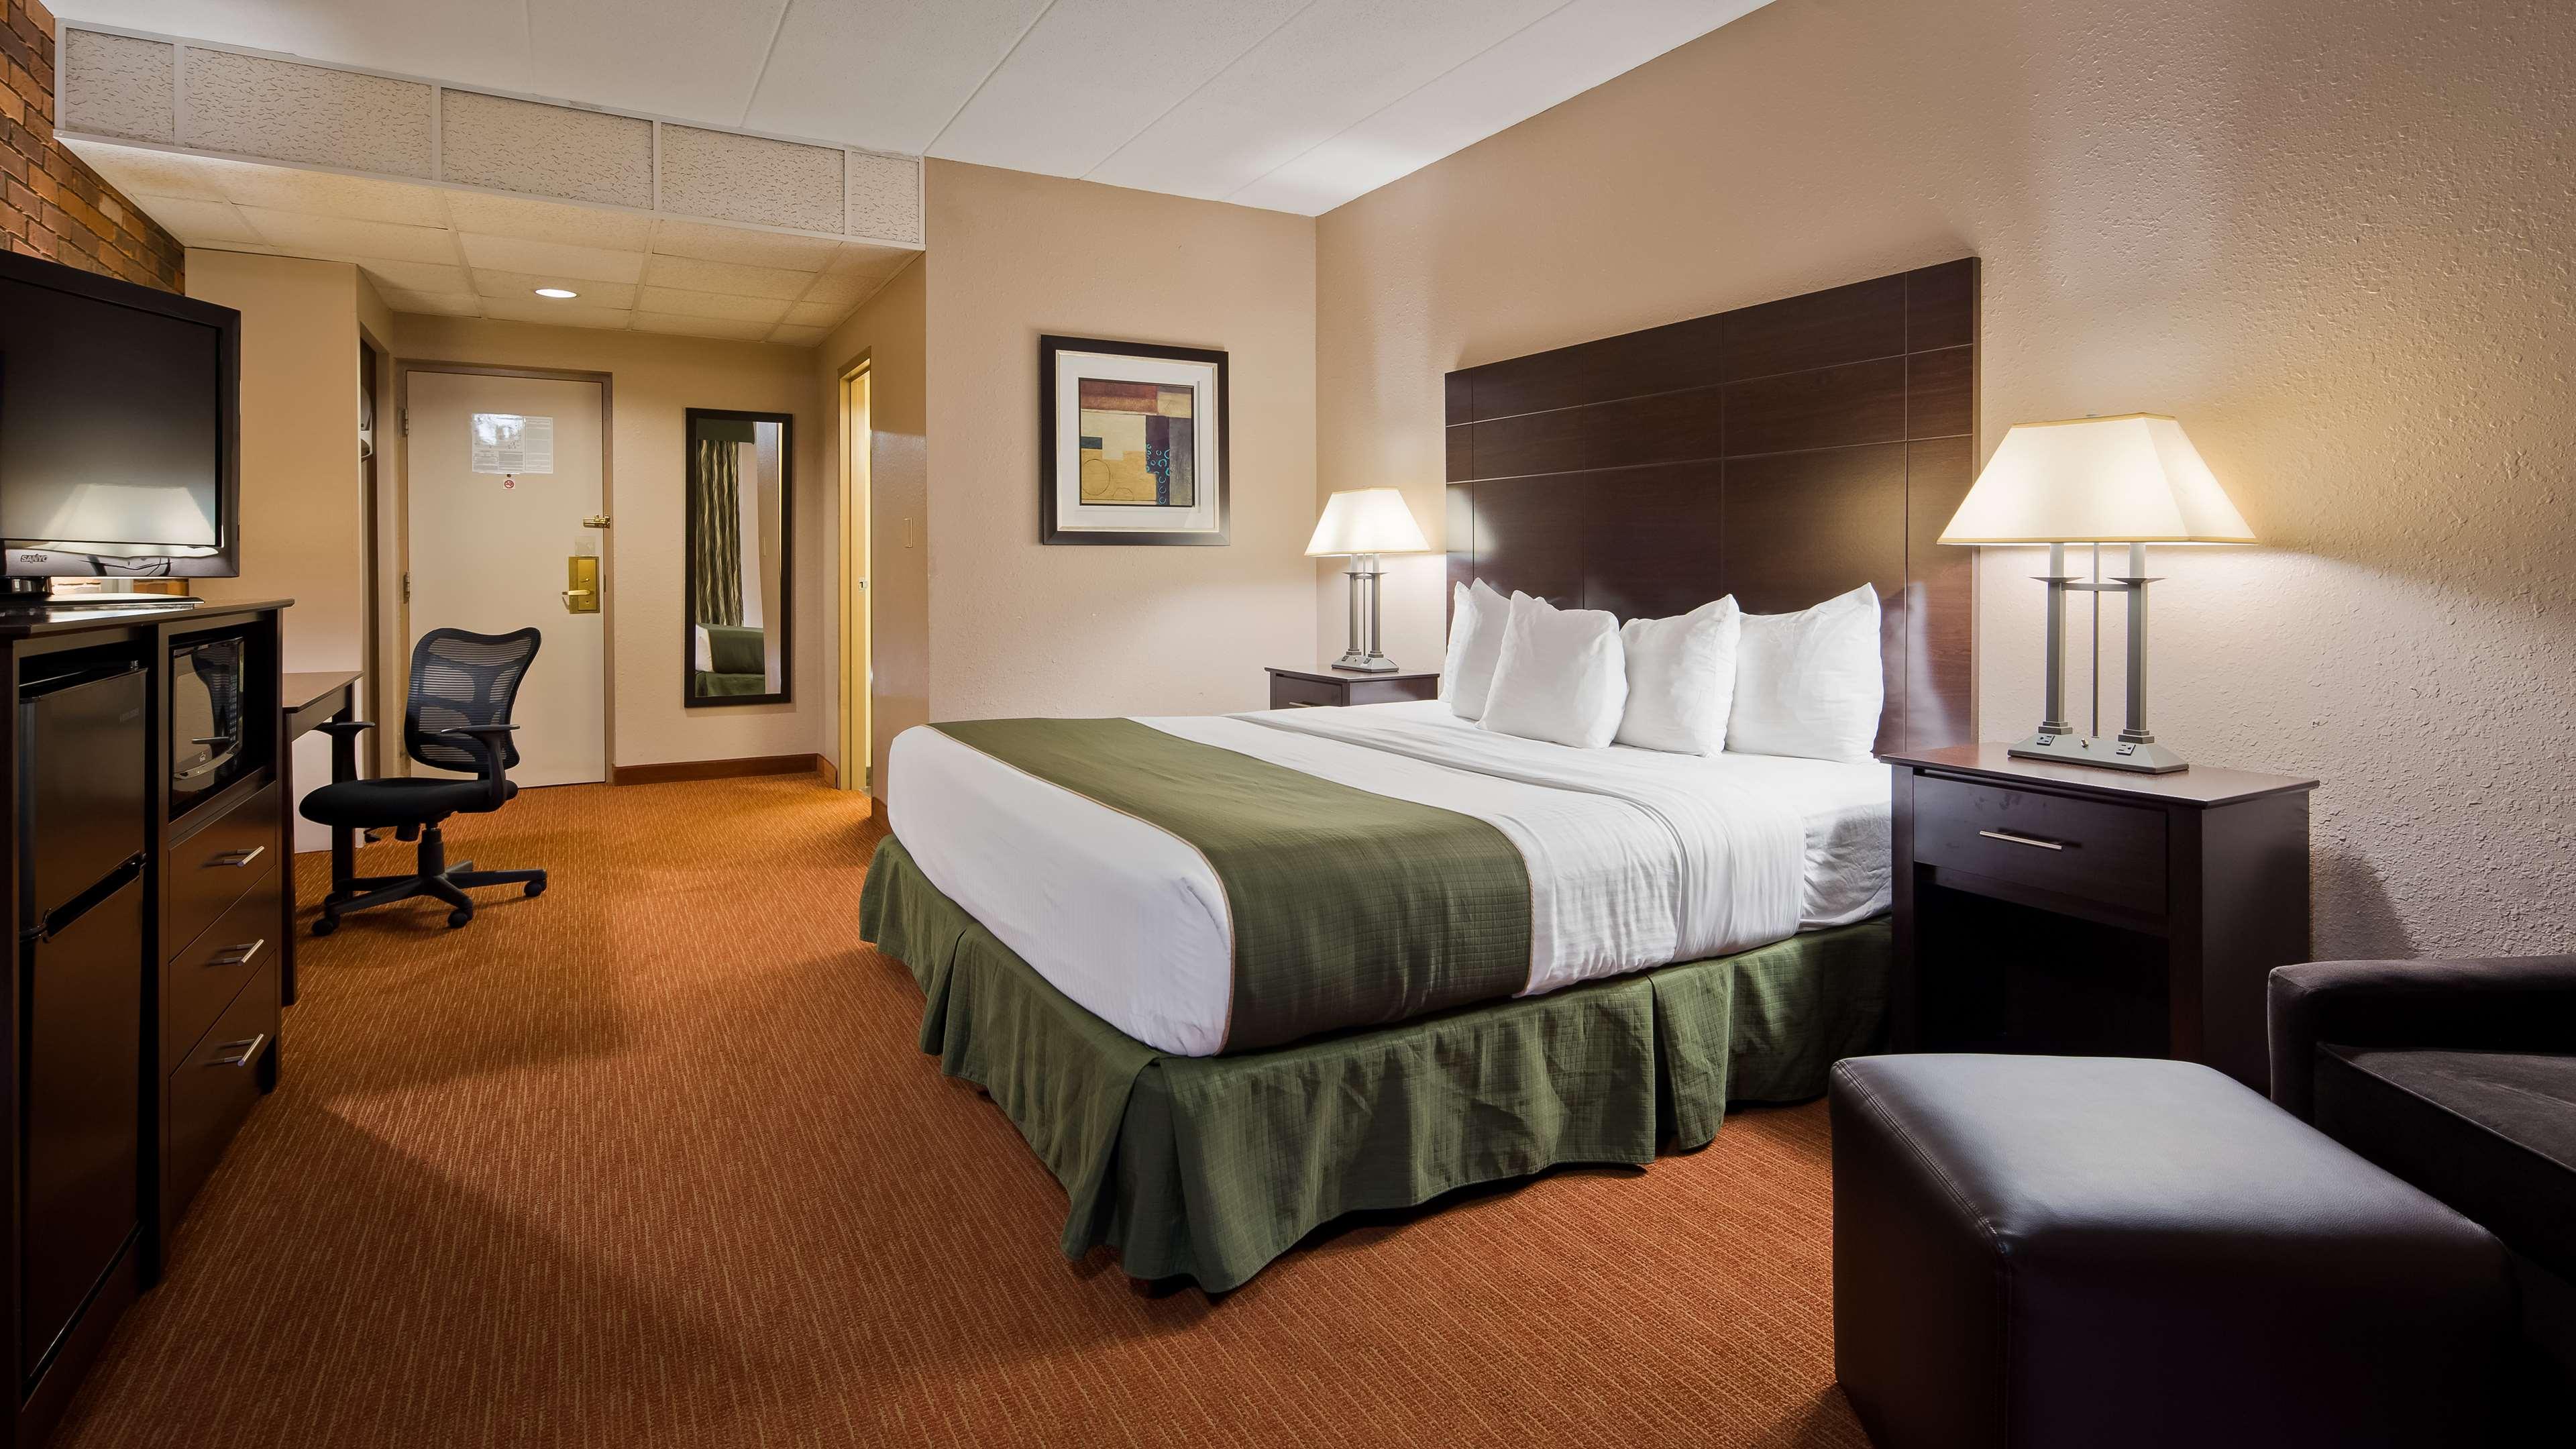 Best Western Valley Plaza Inn image 14